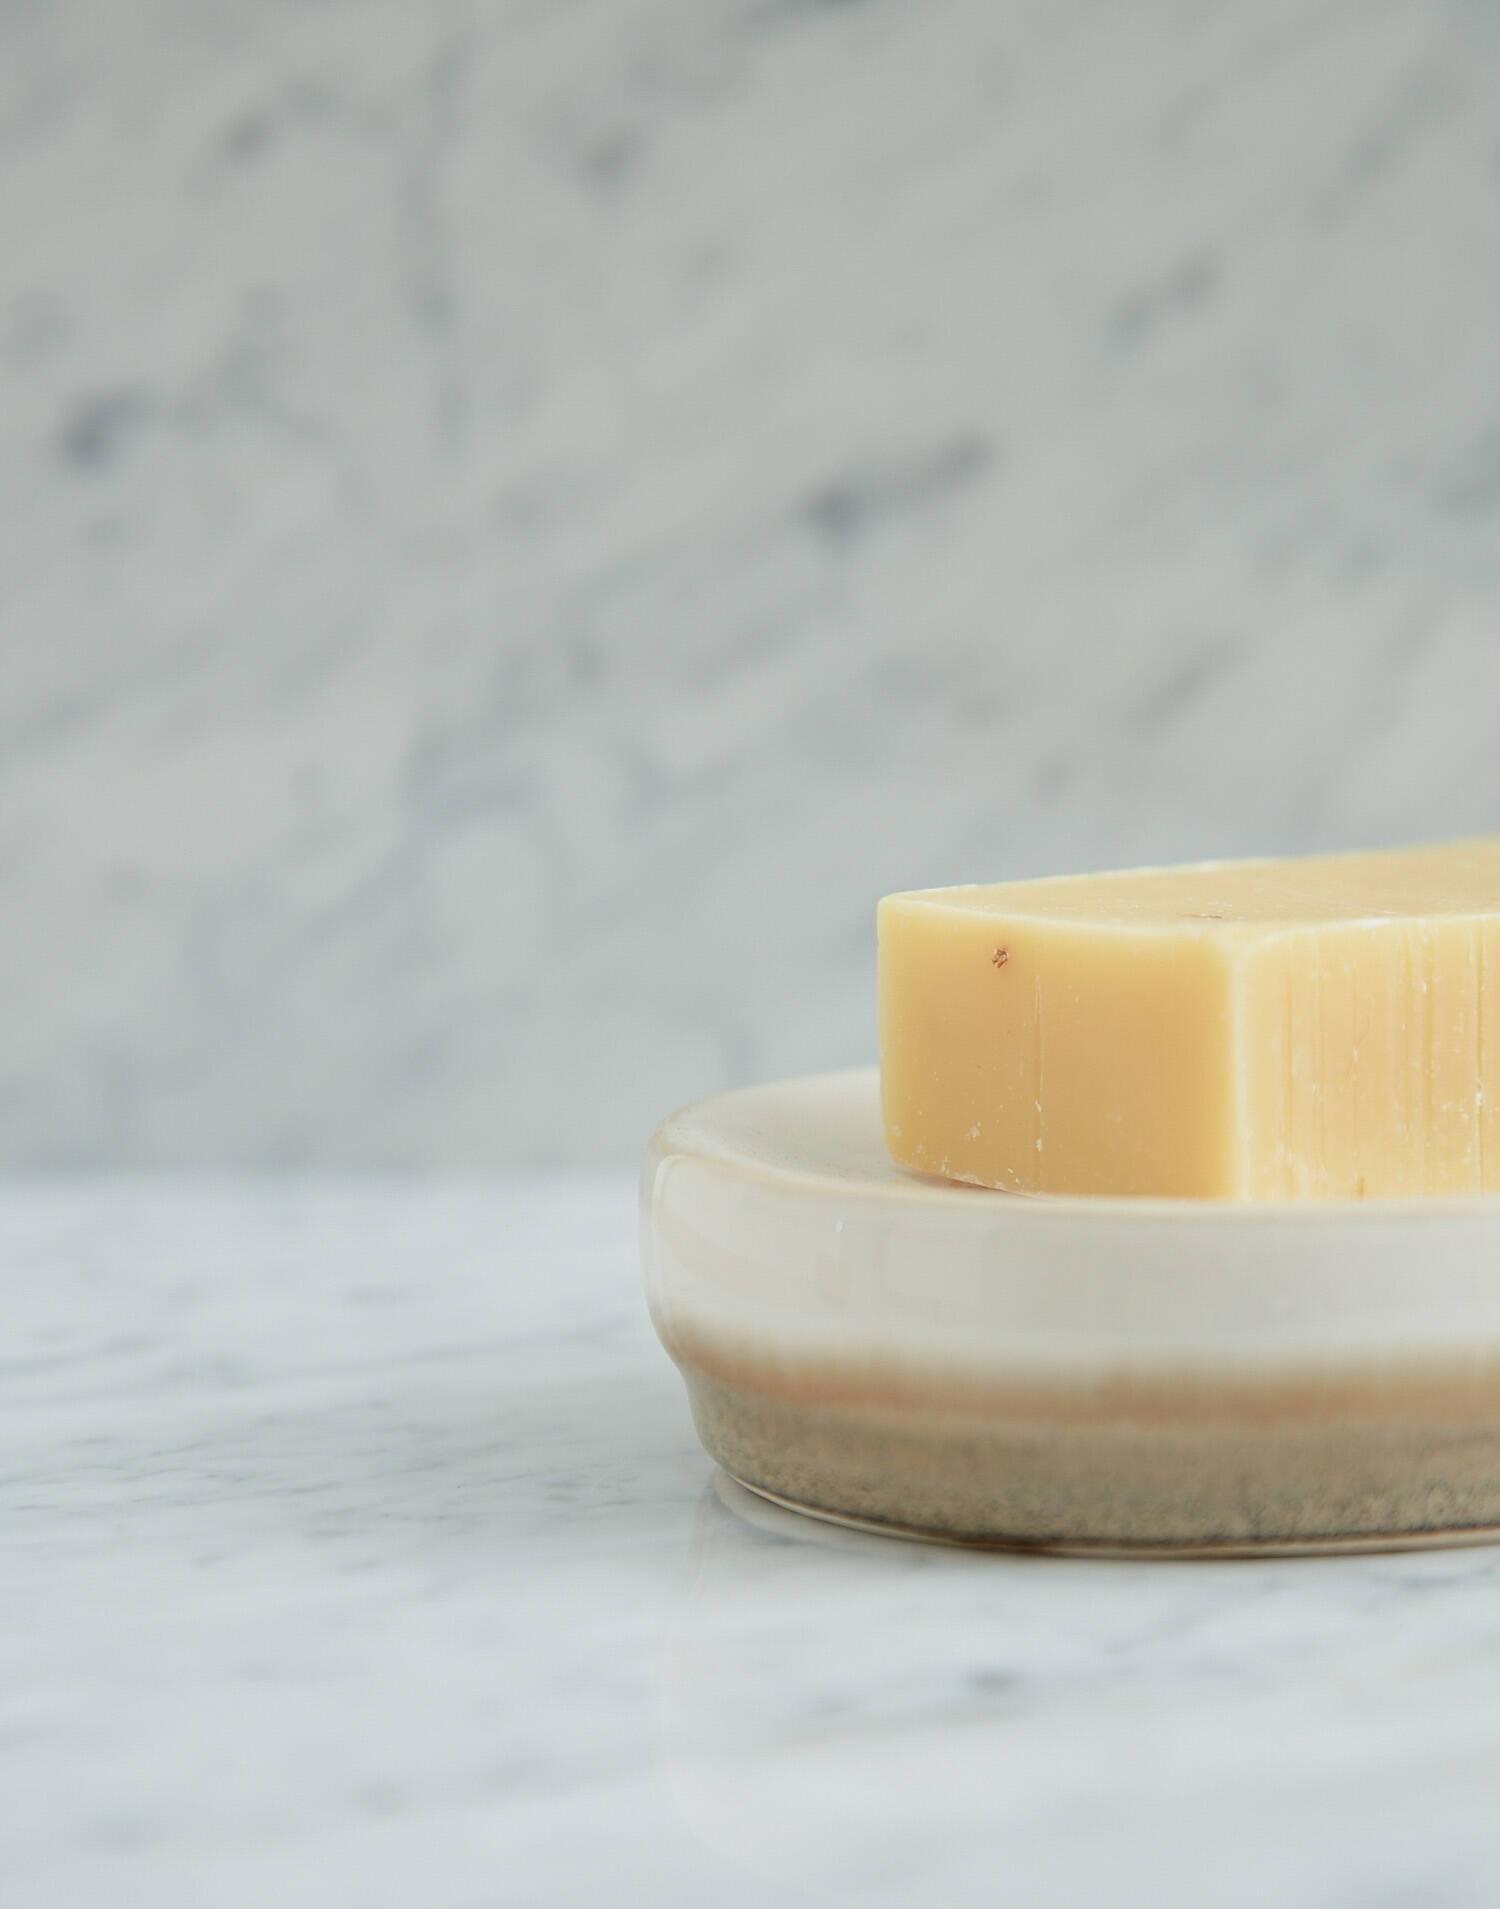 Java soap dish